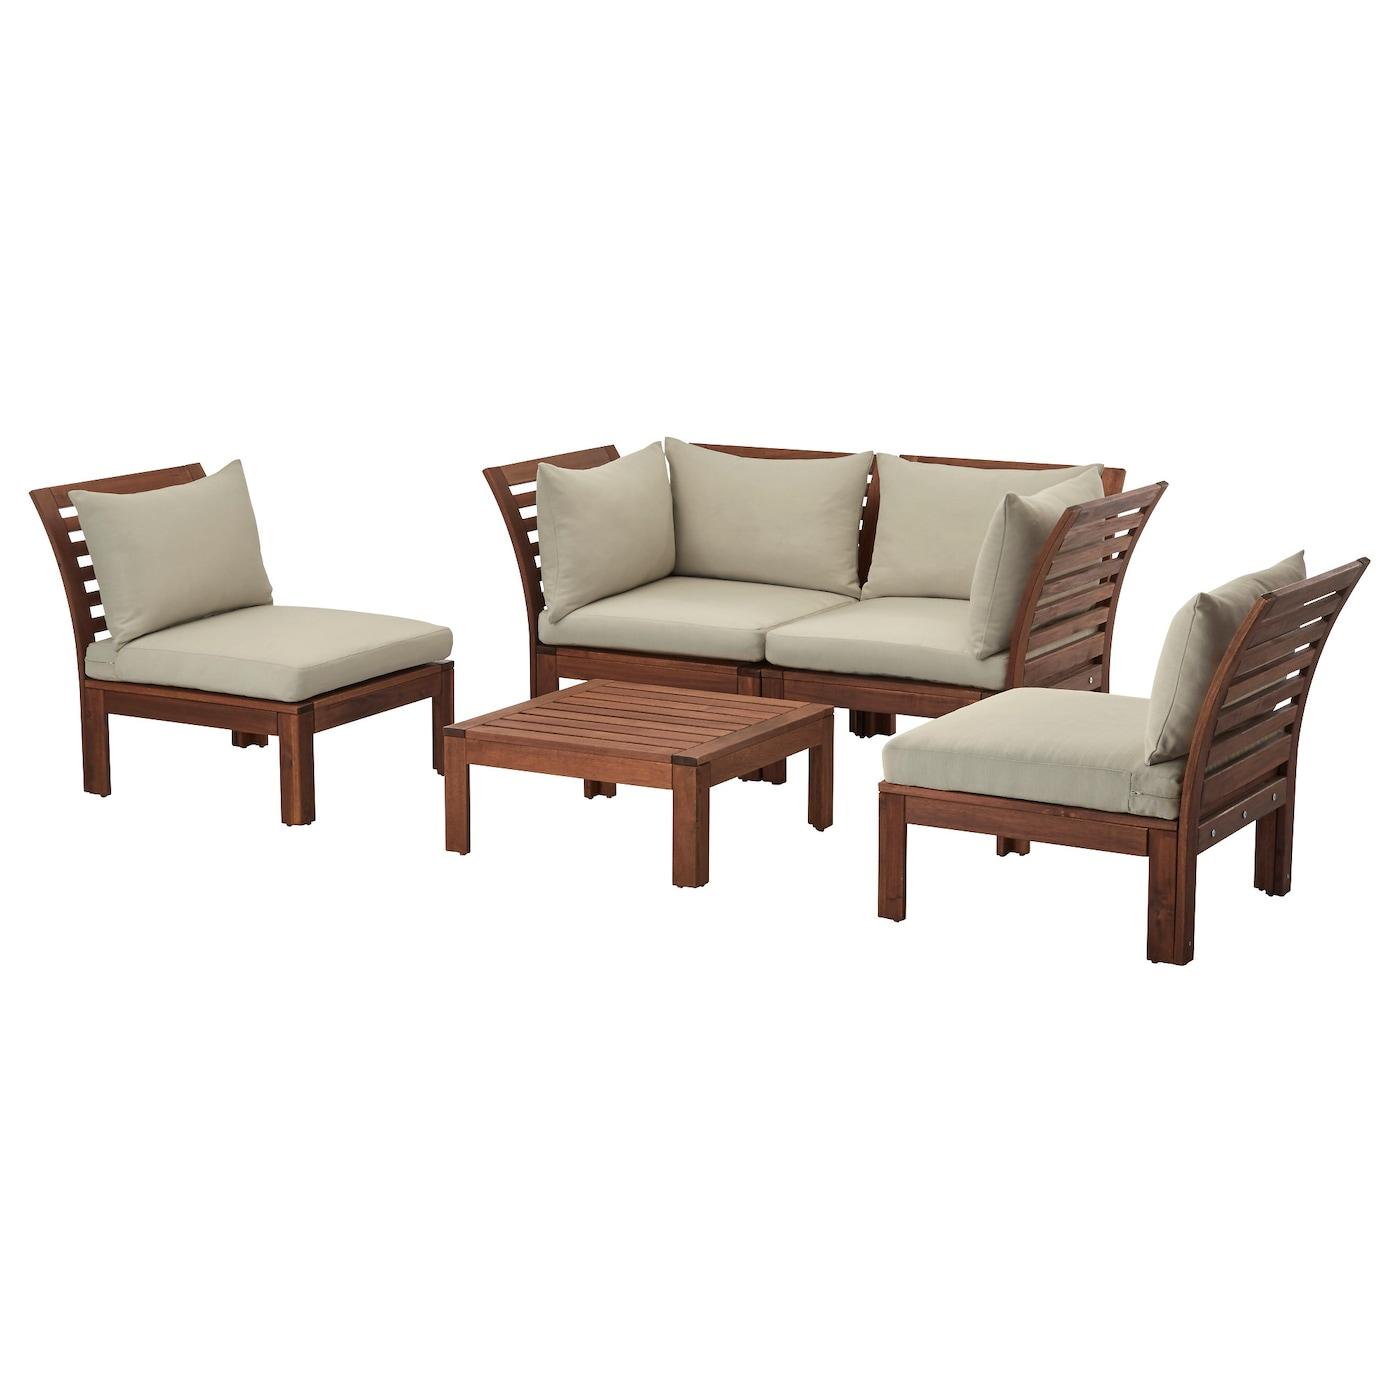 Lounge sofa outdoor holz  ÄPPLARÖ 4-seat conversation set, outdoor Brown stained/hållö beige ...